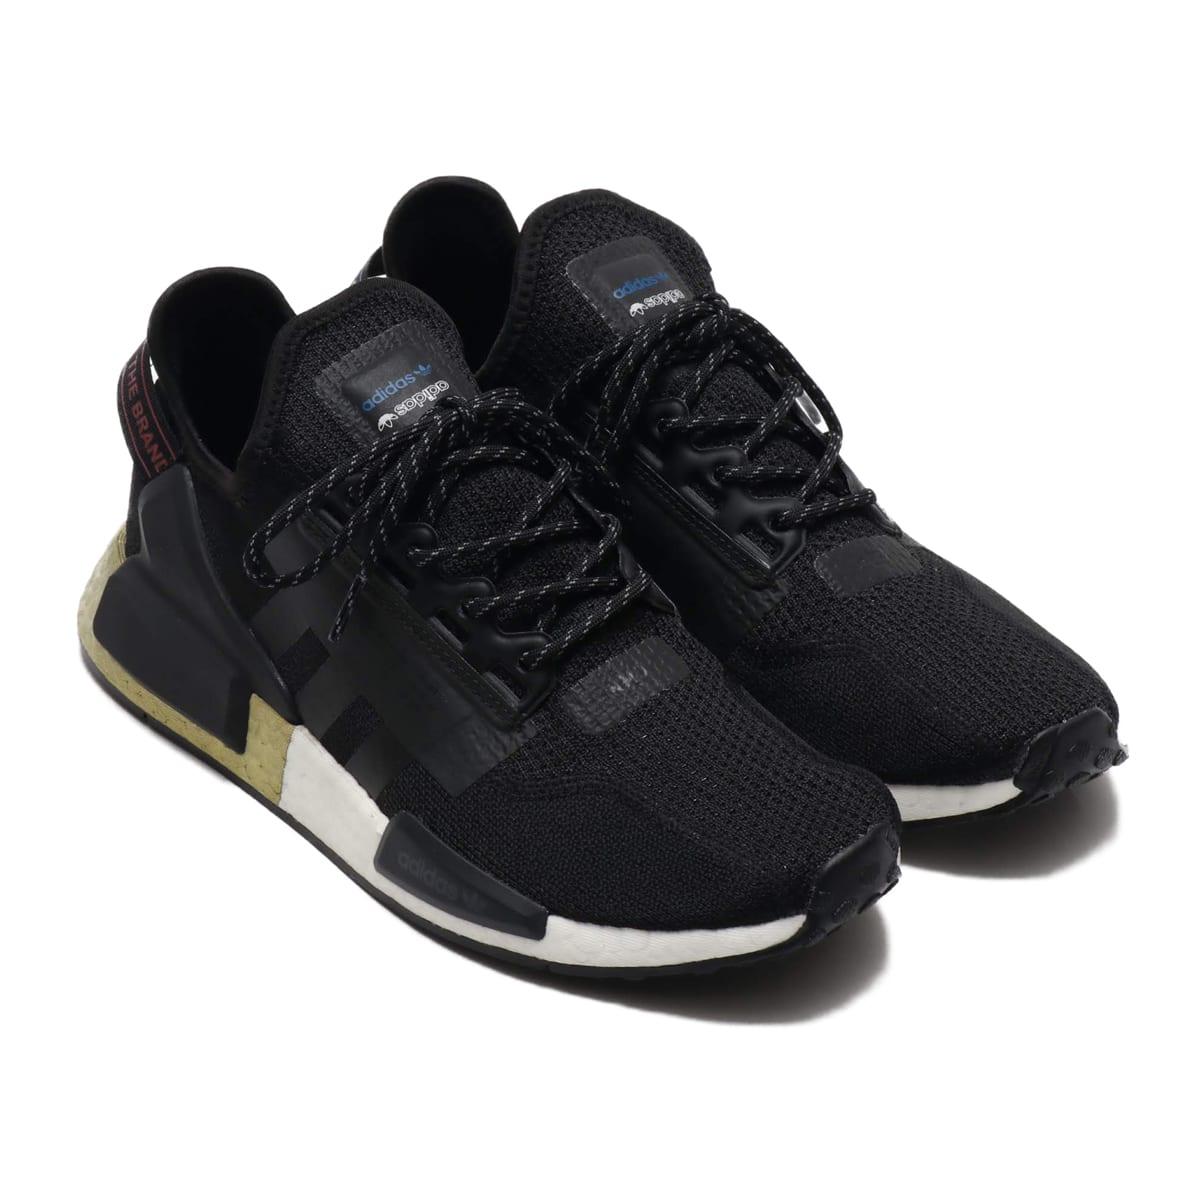 adidas NMD_R1.V2 CORE BLACK/CORE BLACK/GOLD METRIC 20SS-I_photo_large